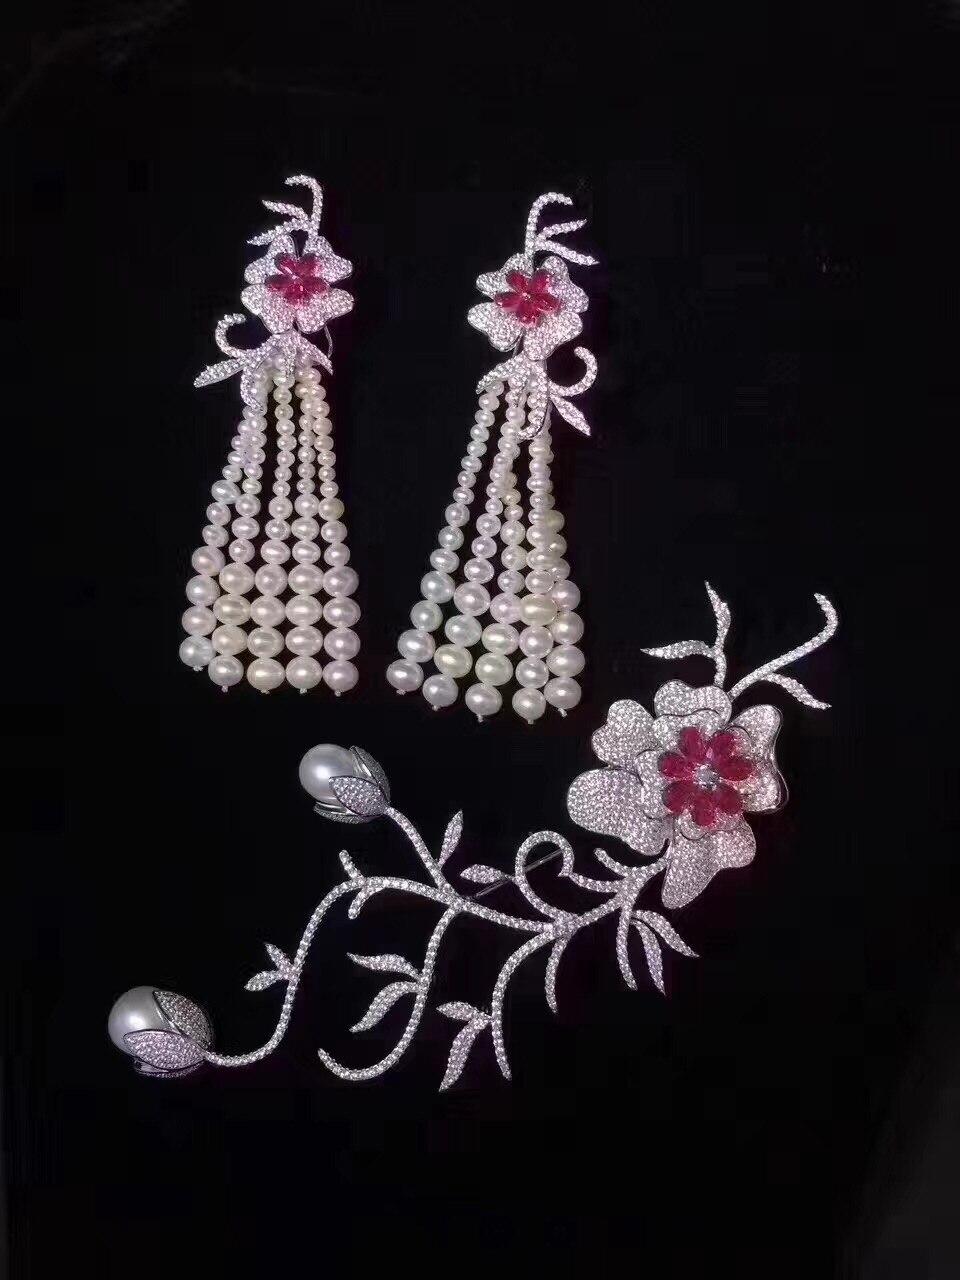 bridal jewelry sets natural fresh water pearl tassels earring and brooch sets 925 sterling silver flower long earring fine jewel